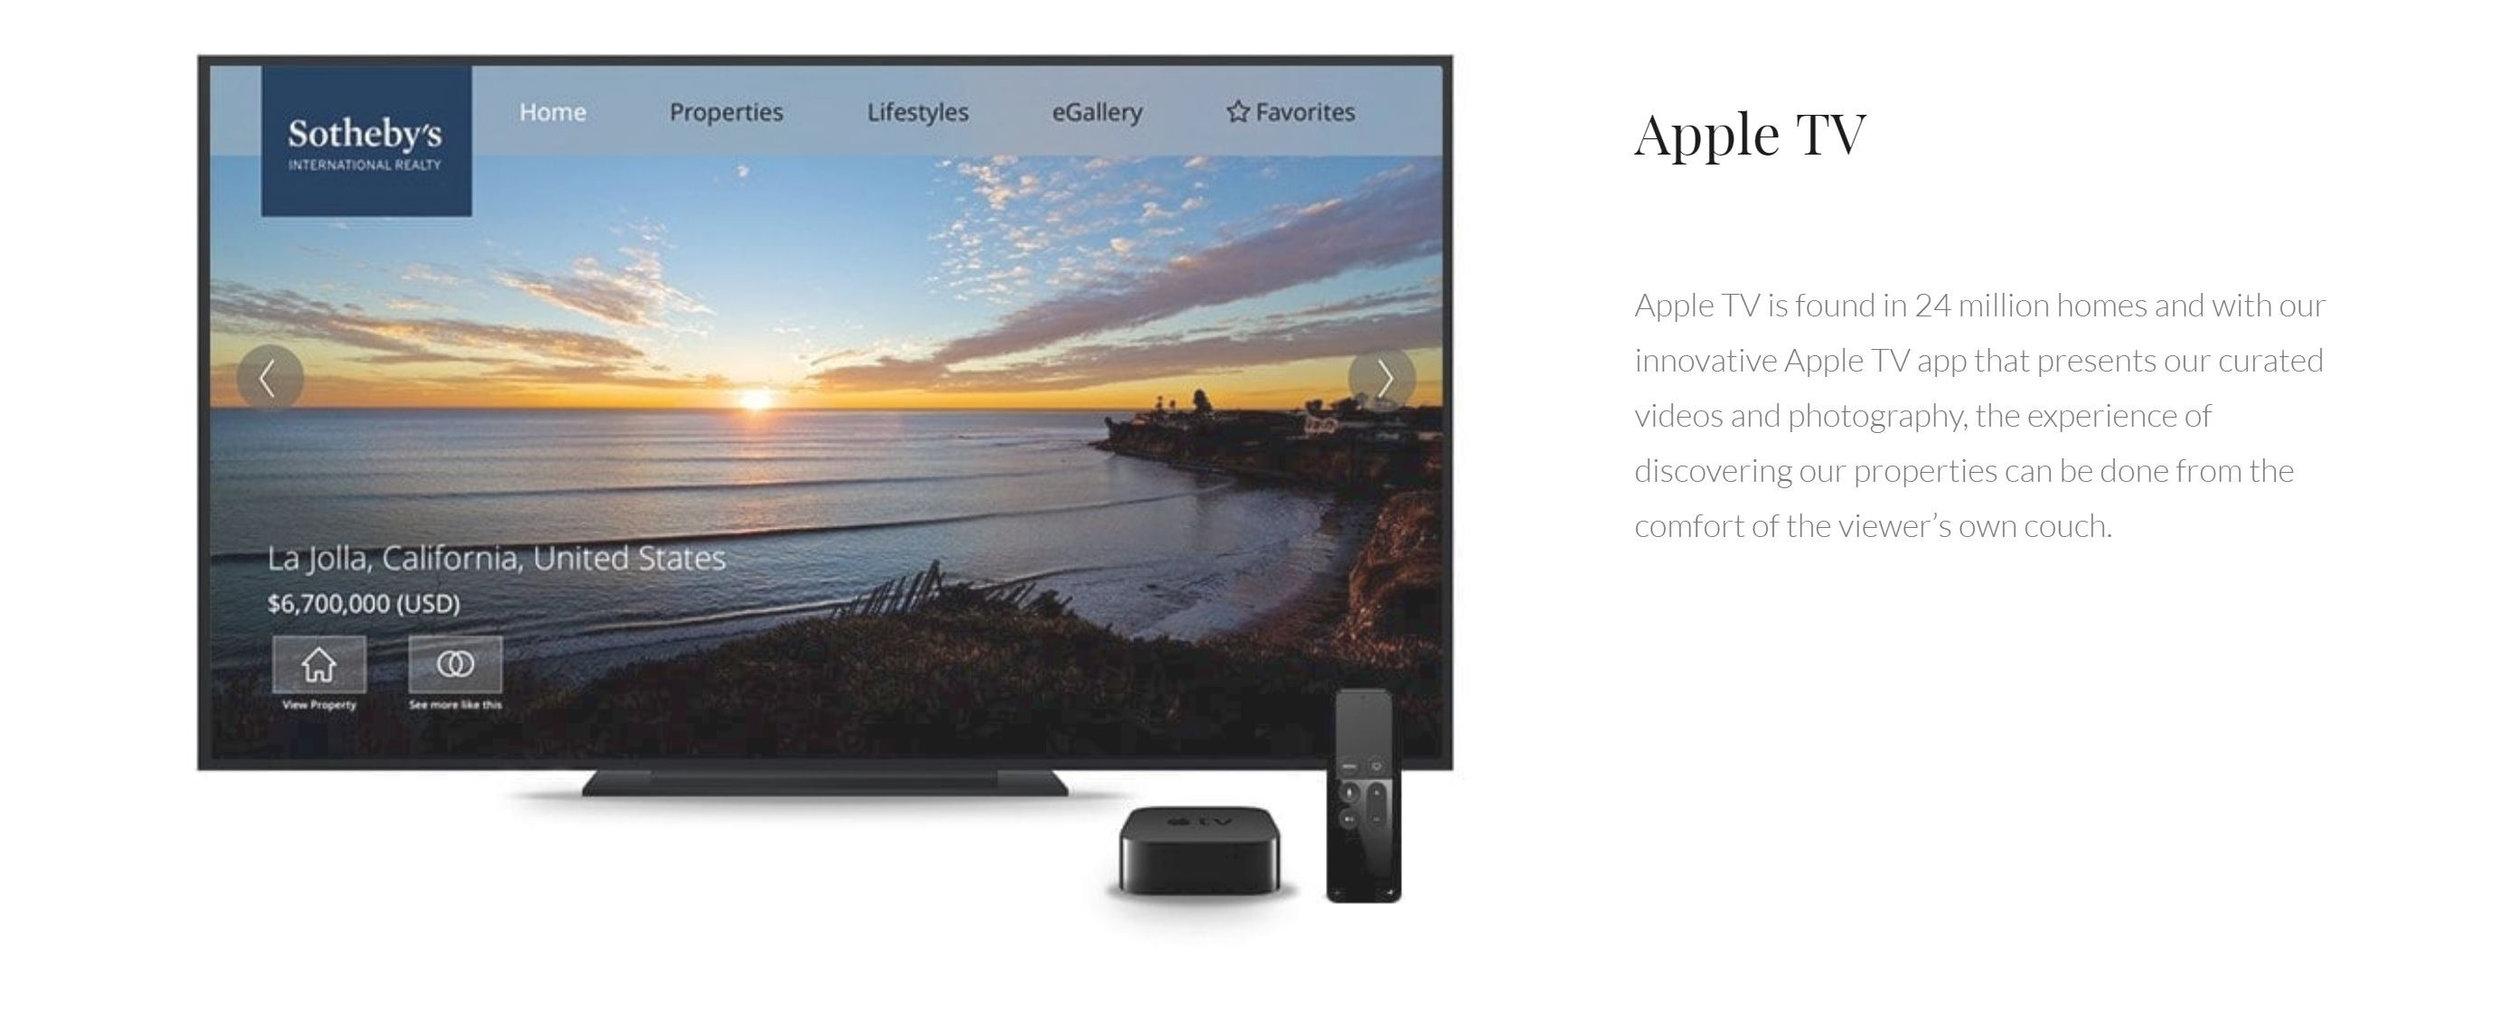 apple_tv_3a.JPG